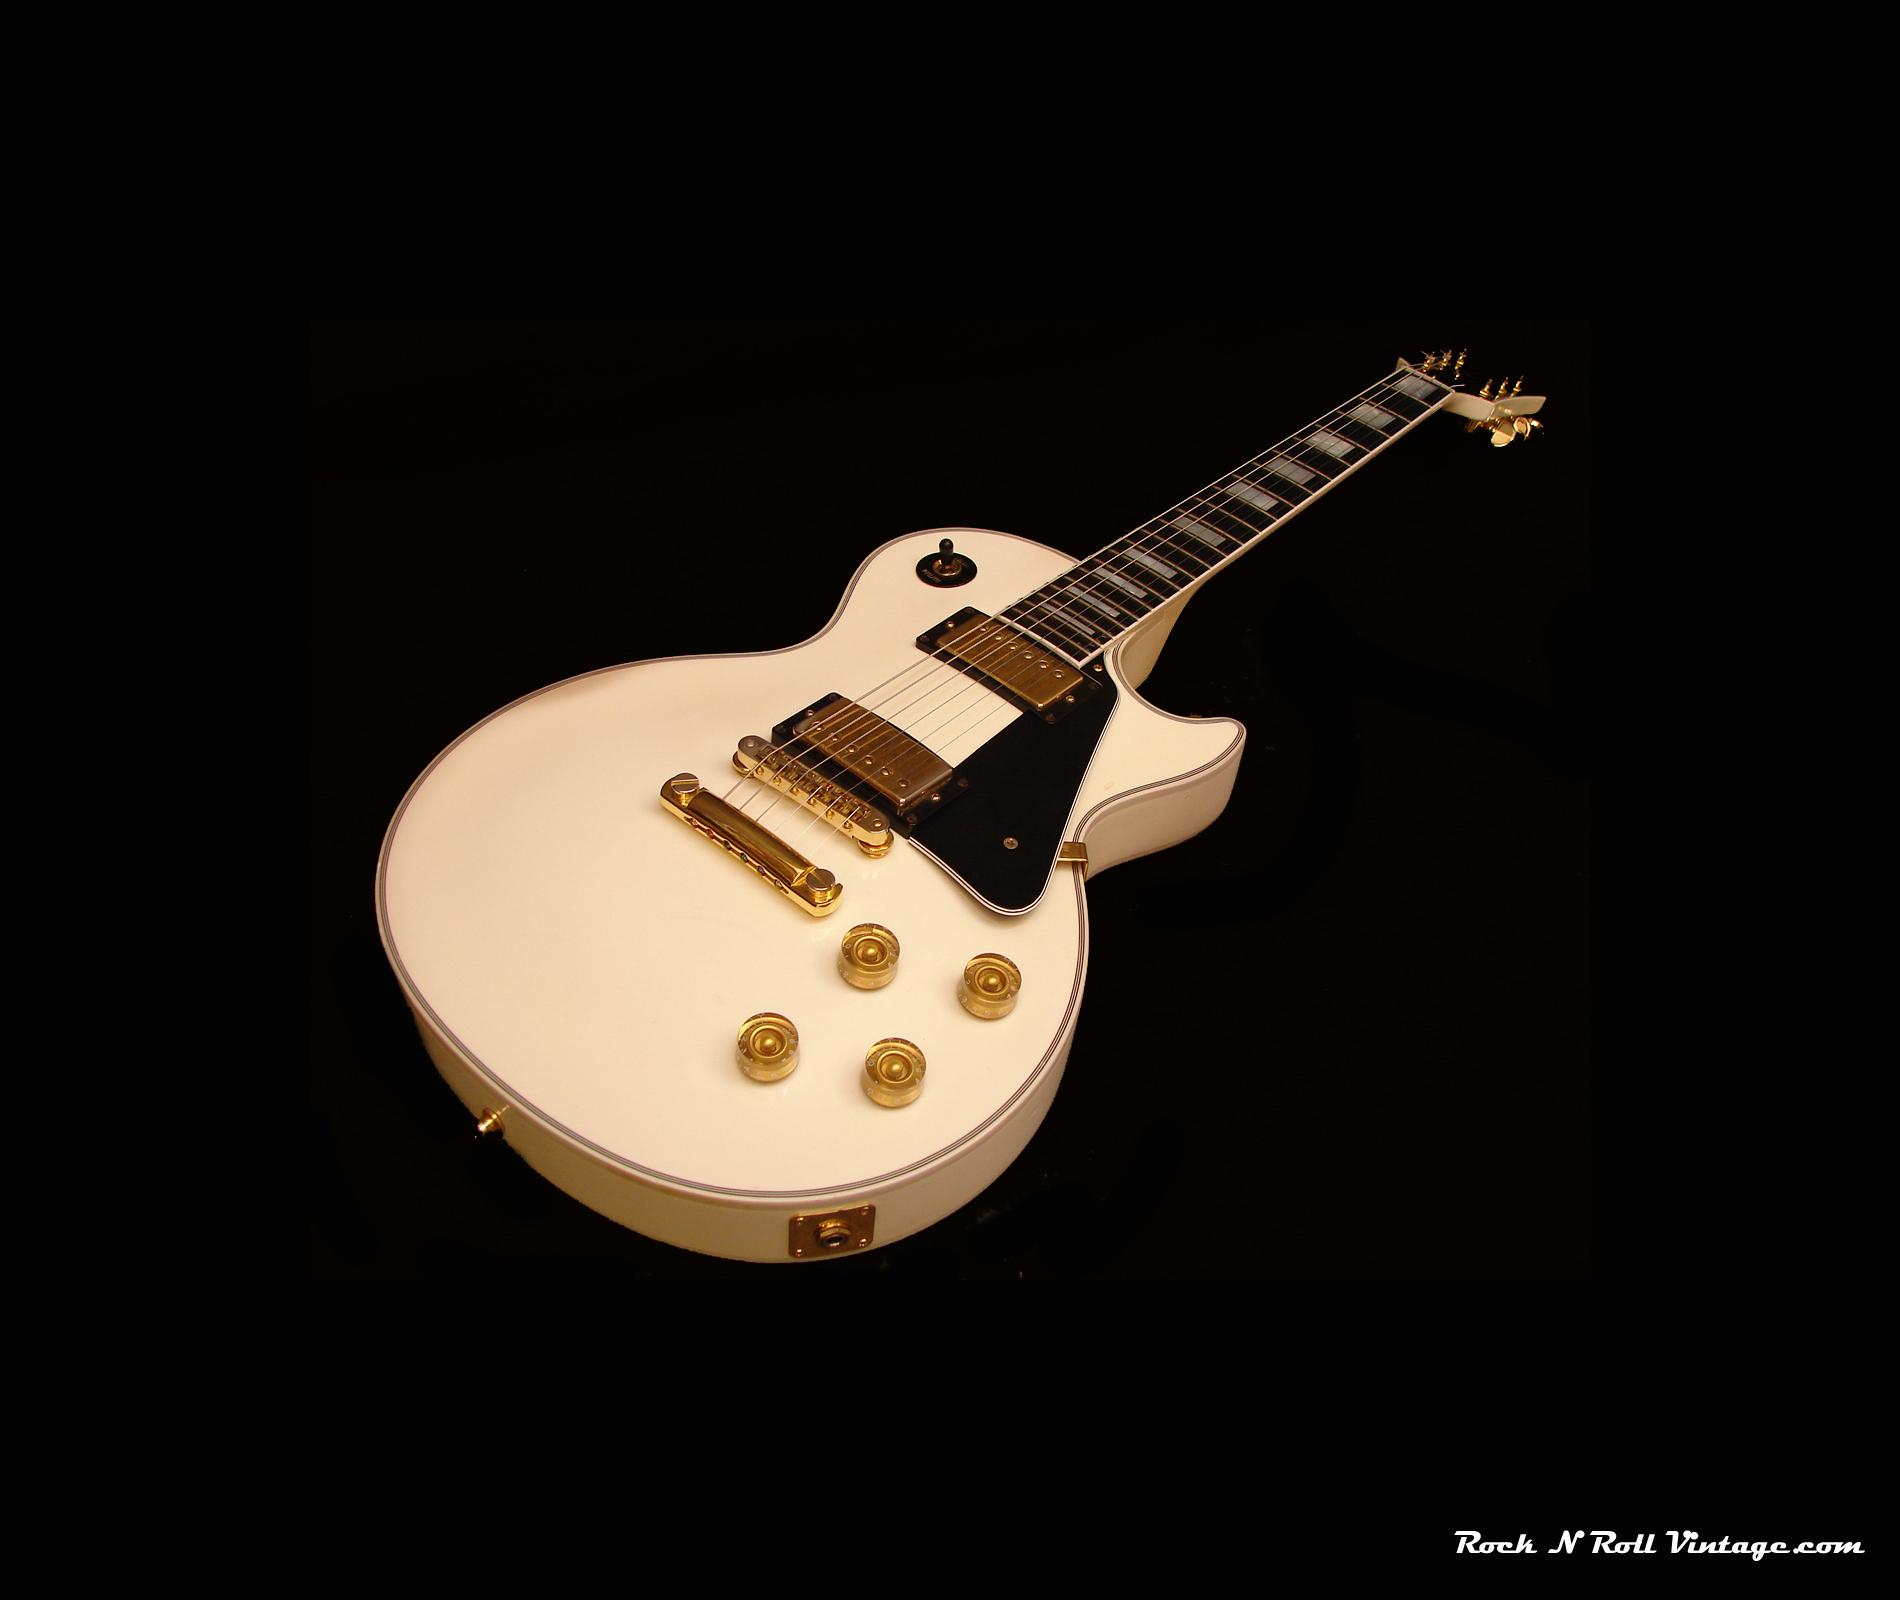 1987 Les Paul Custom. 1965 Fender Mustang Wallpaper